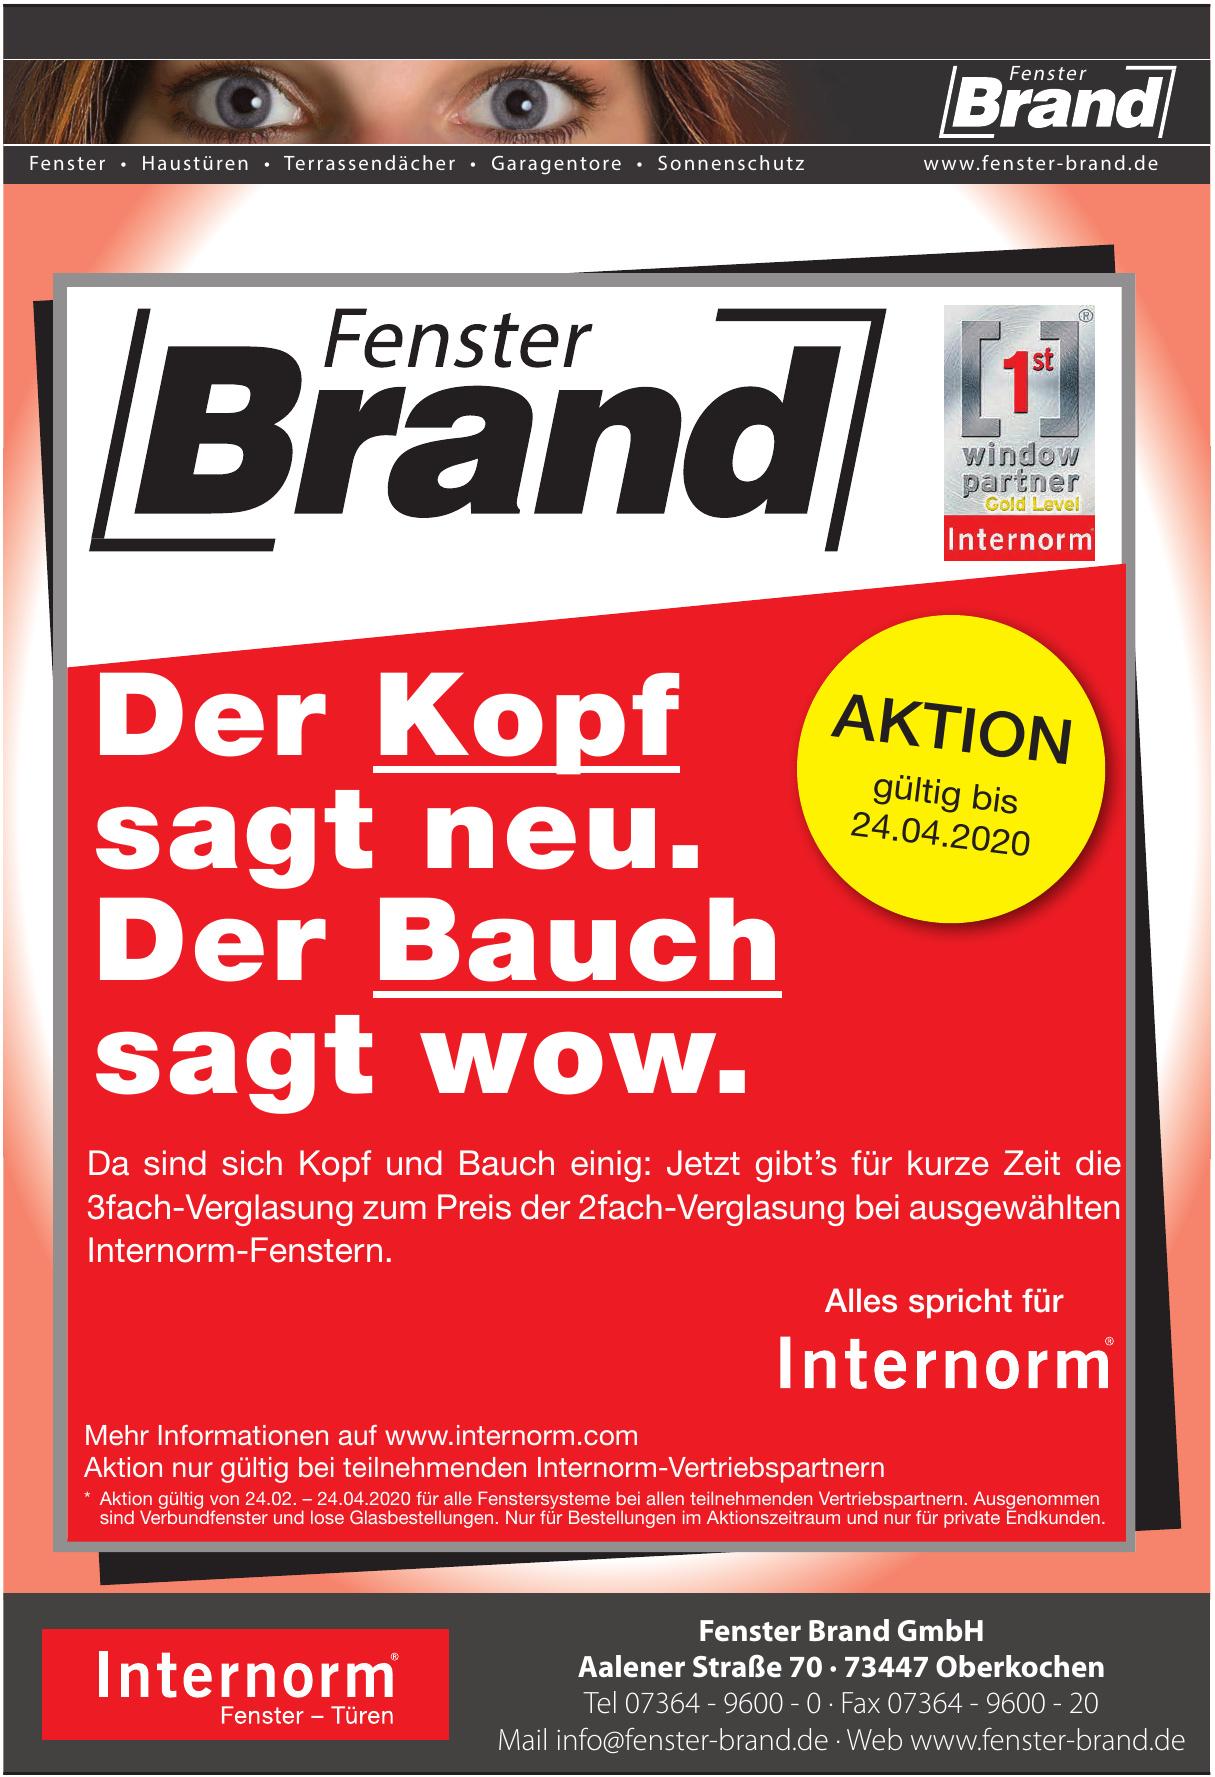 Fenster Brand GmbH